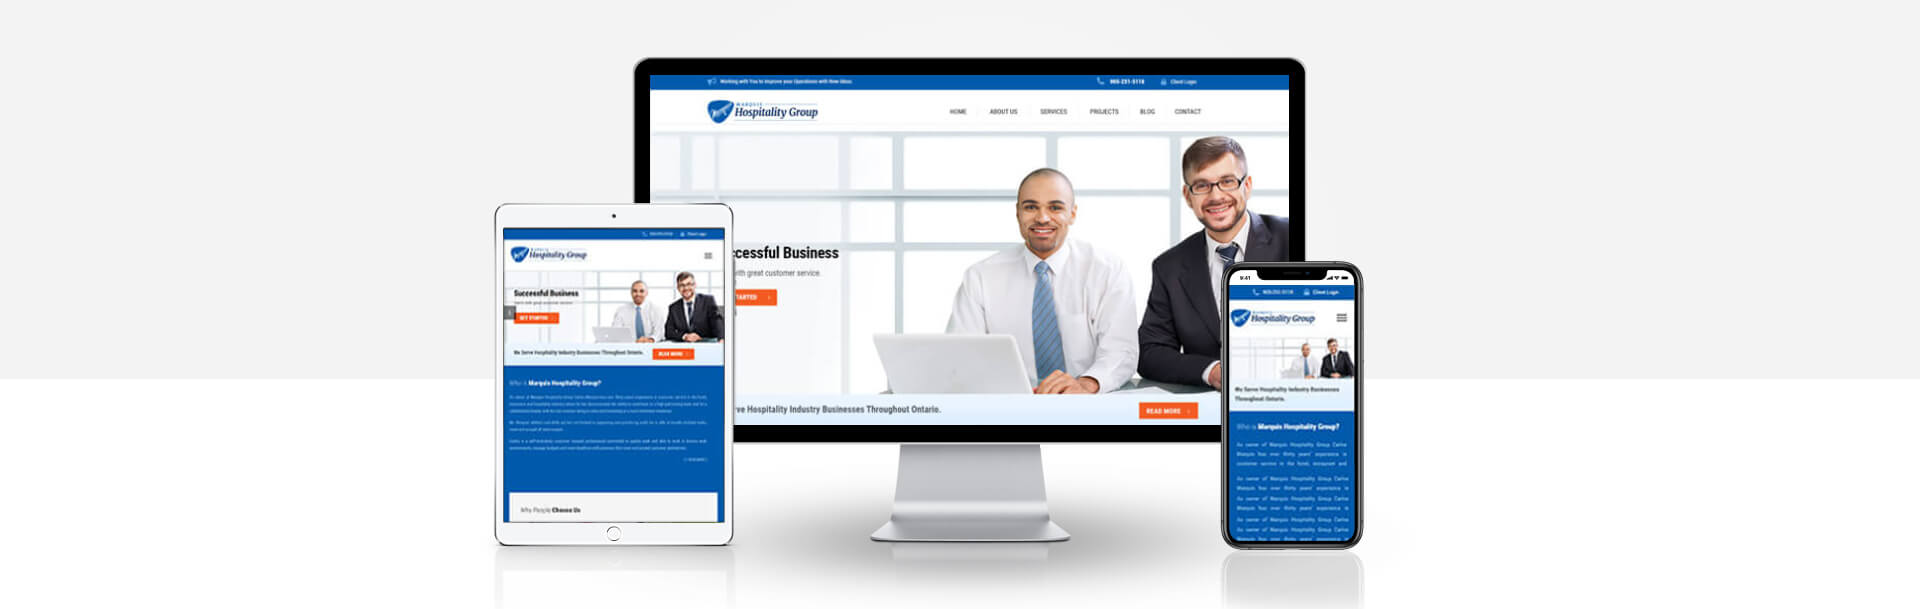 Wordpress hospitality business website